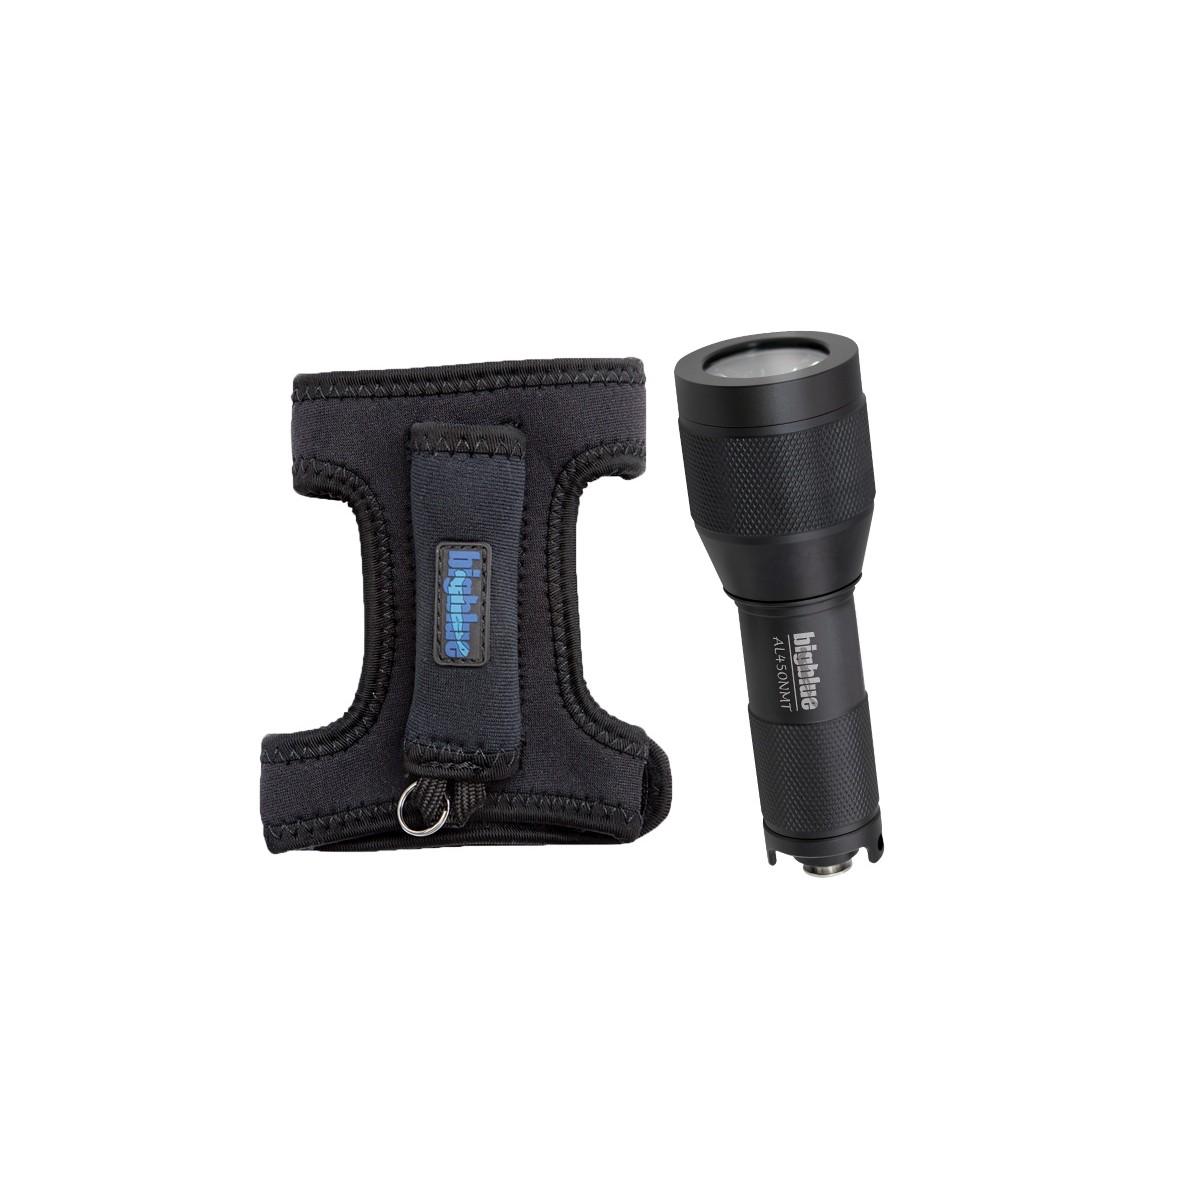 Bigblue 450 Lumen Narrow Beam w/ Glove (AL450NMT-G)